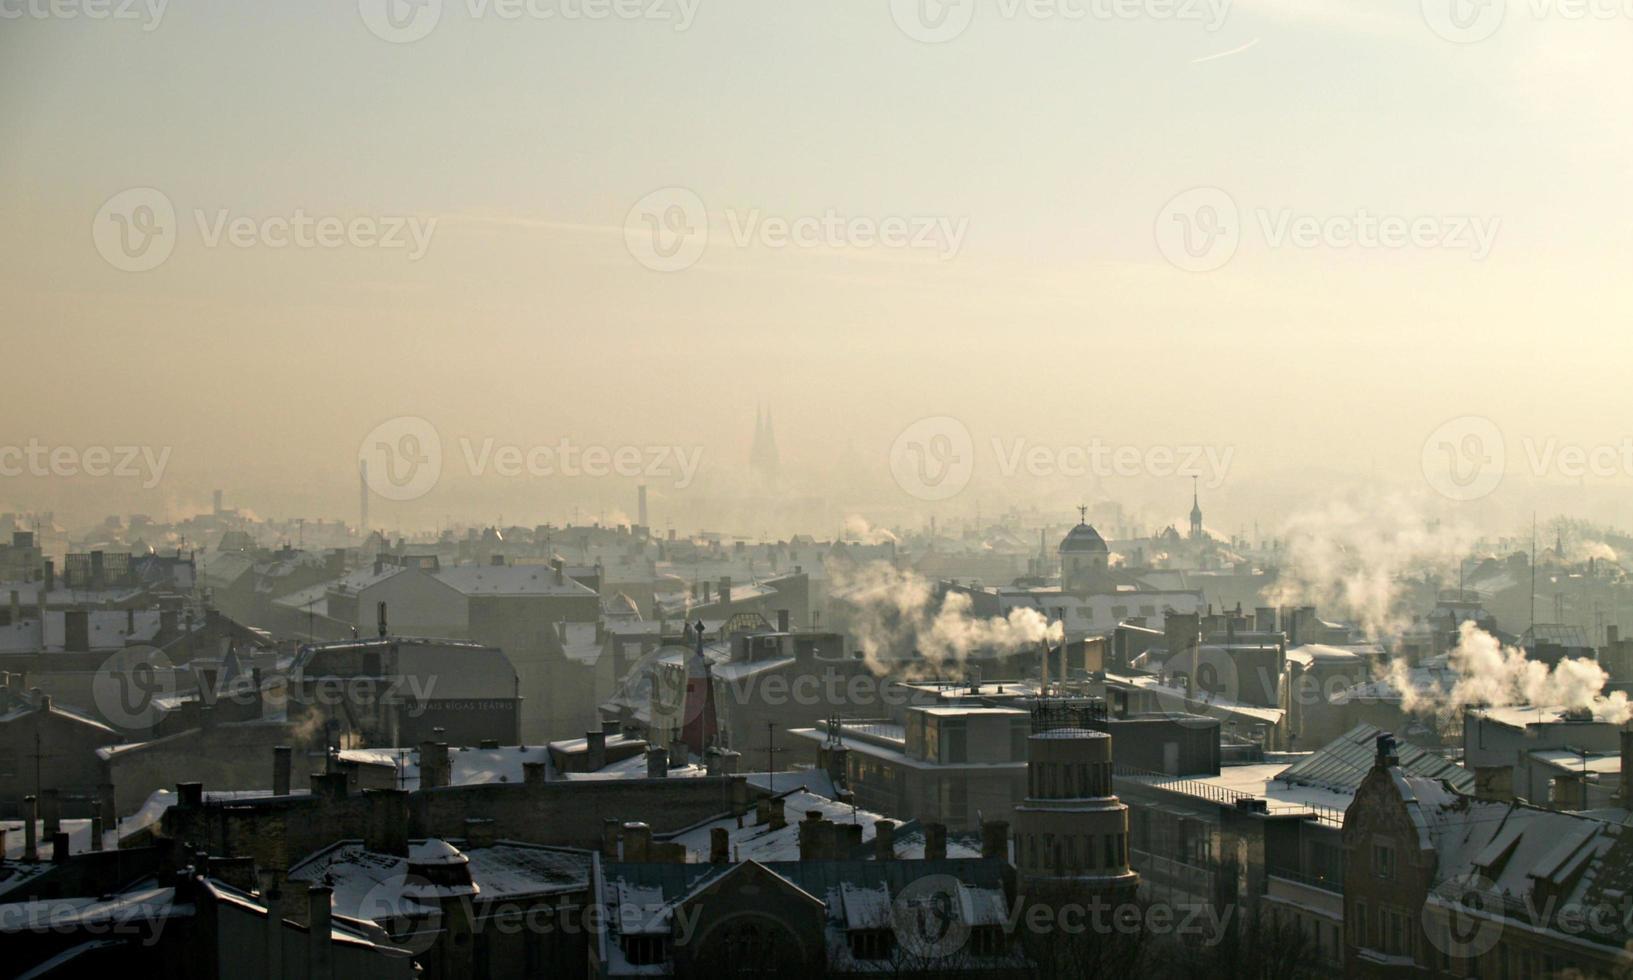 Rooftops in winter photo